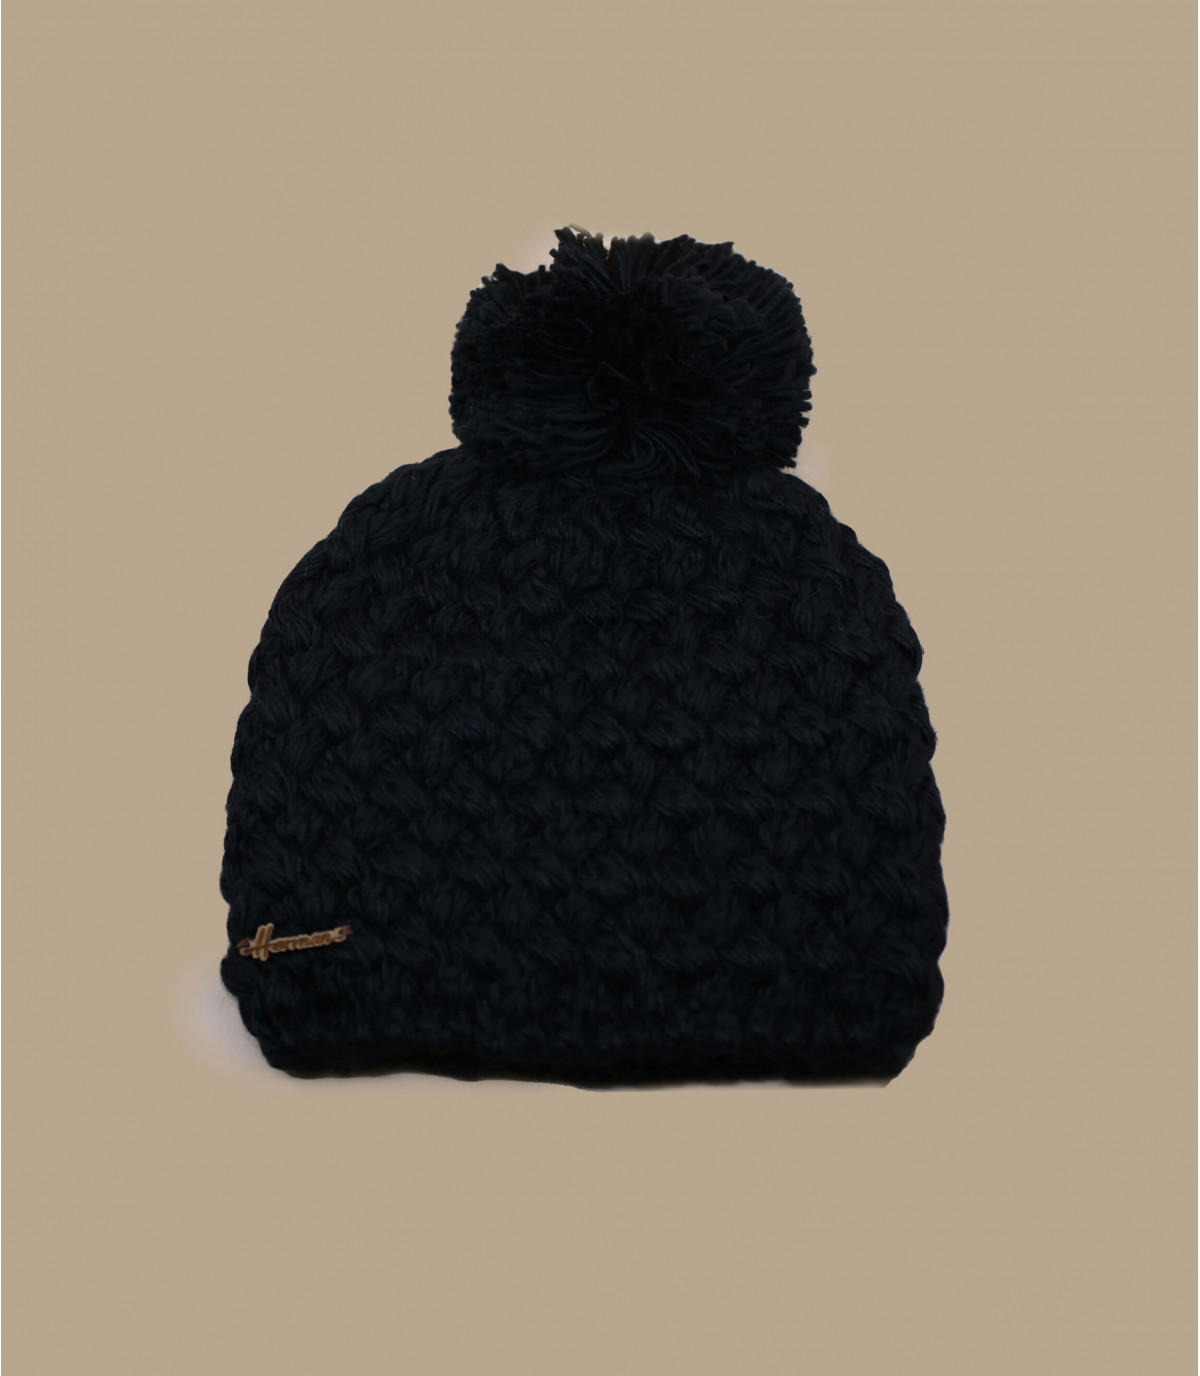 lana negro gorro borla